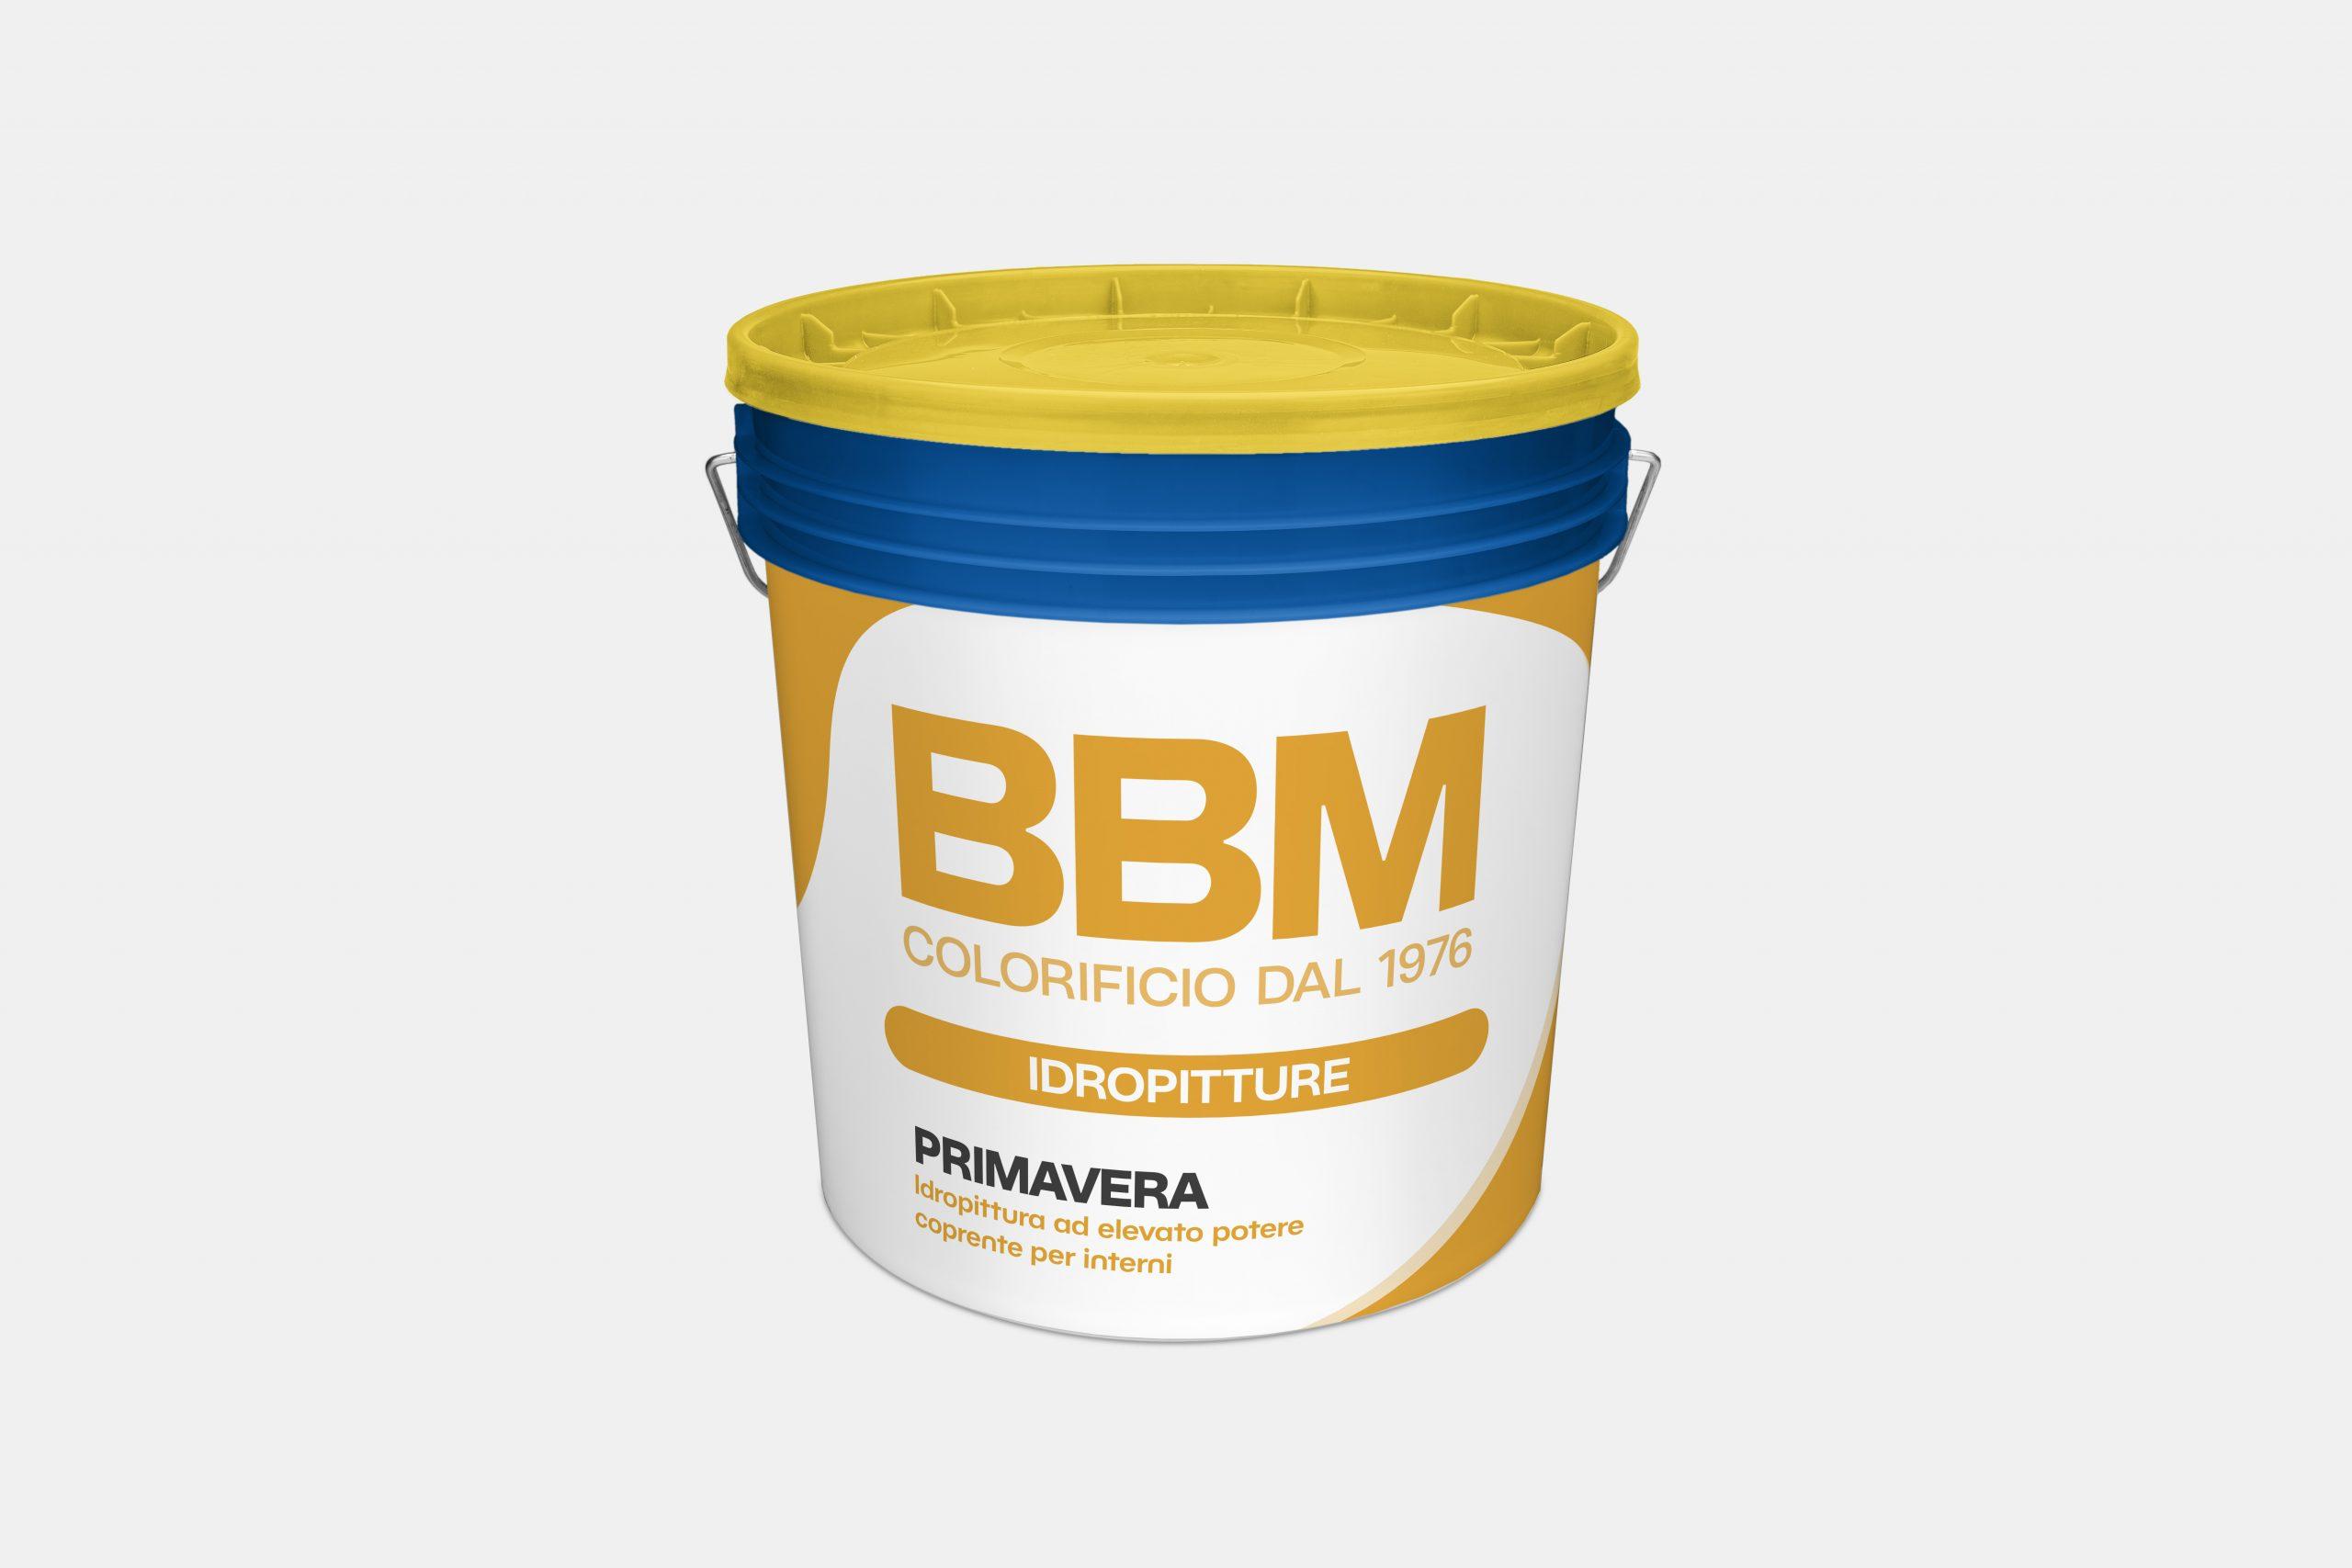 https://bbm-colorificio.it/wp-content/uploads/2021/05/Primavera-scaled.jpg